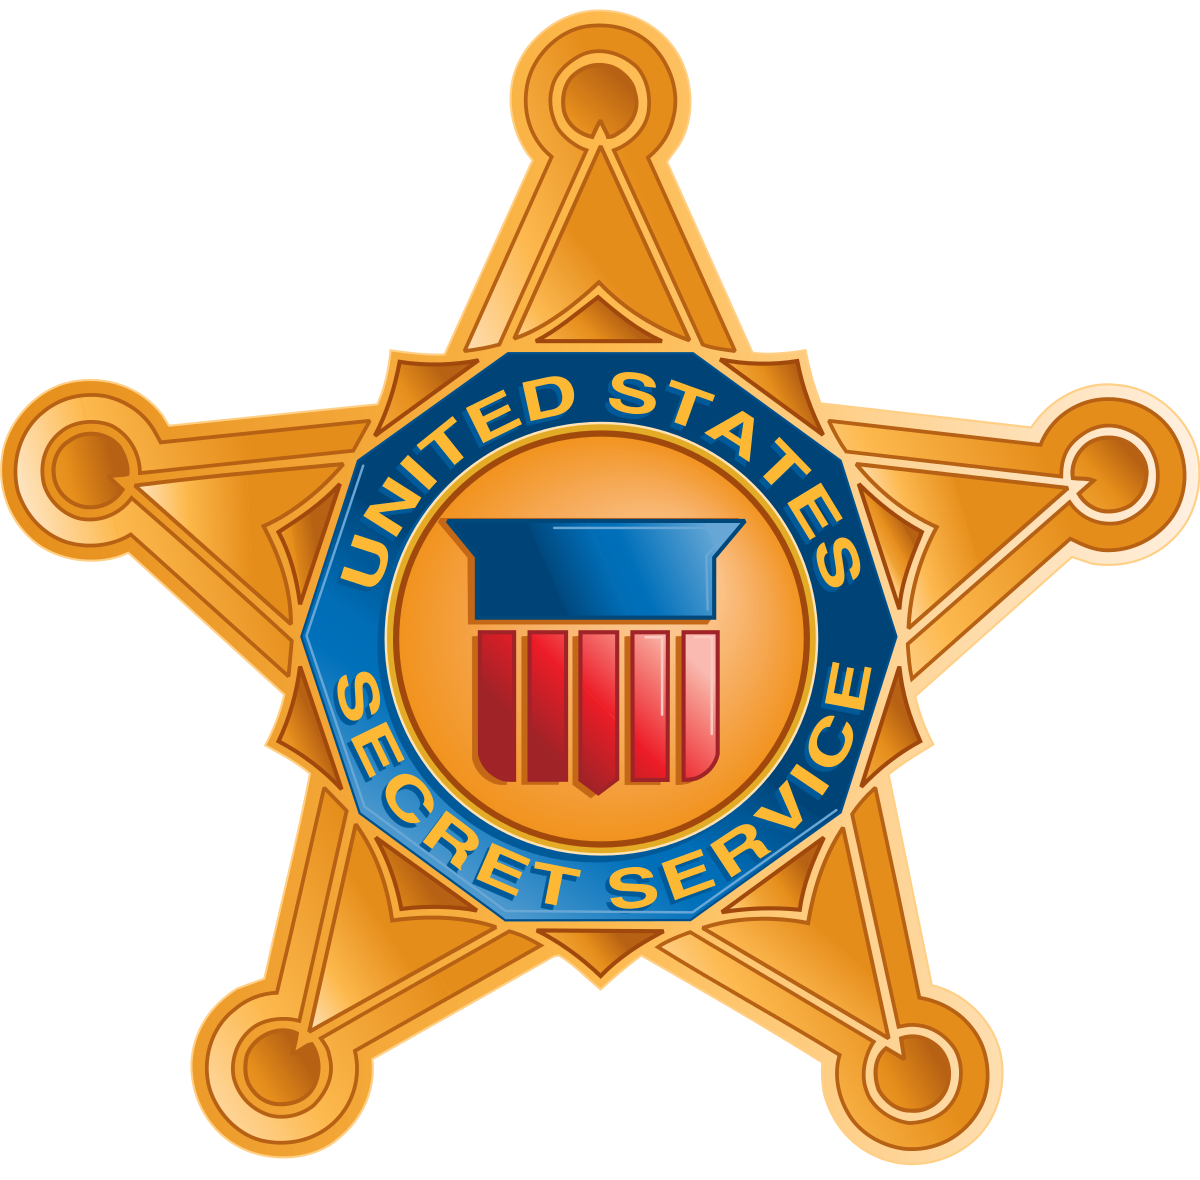 The U.S. Secret Service